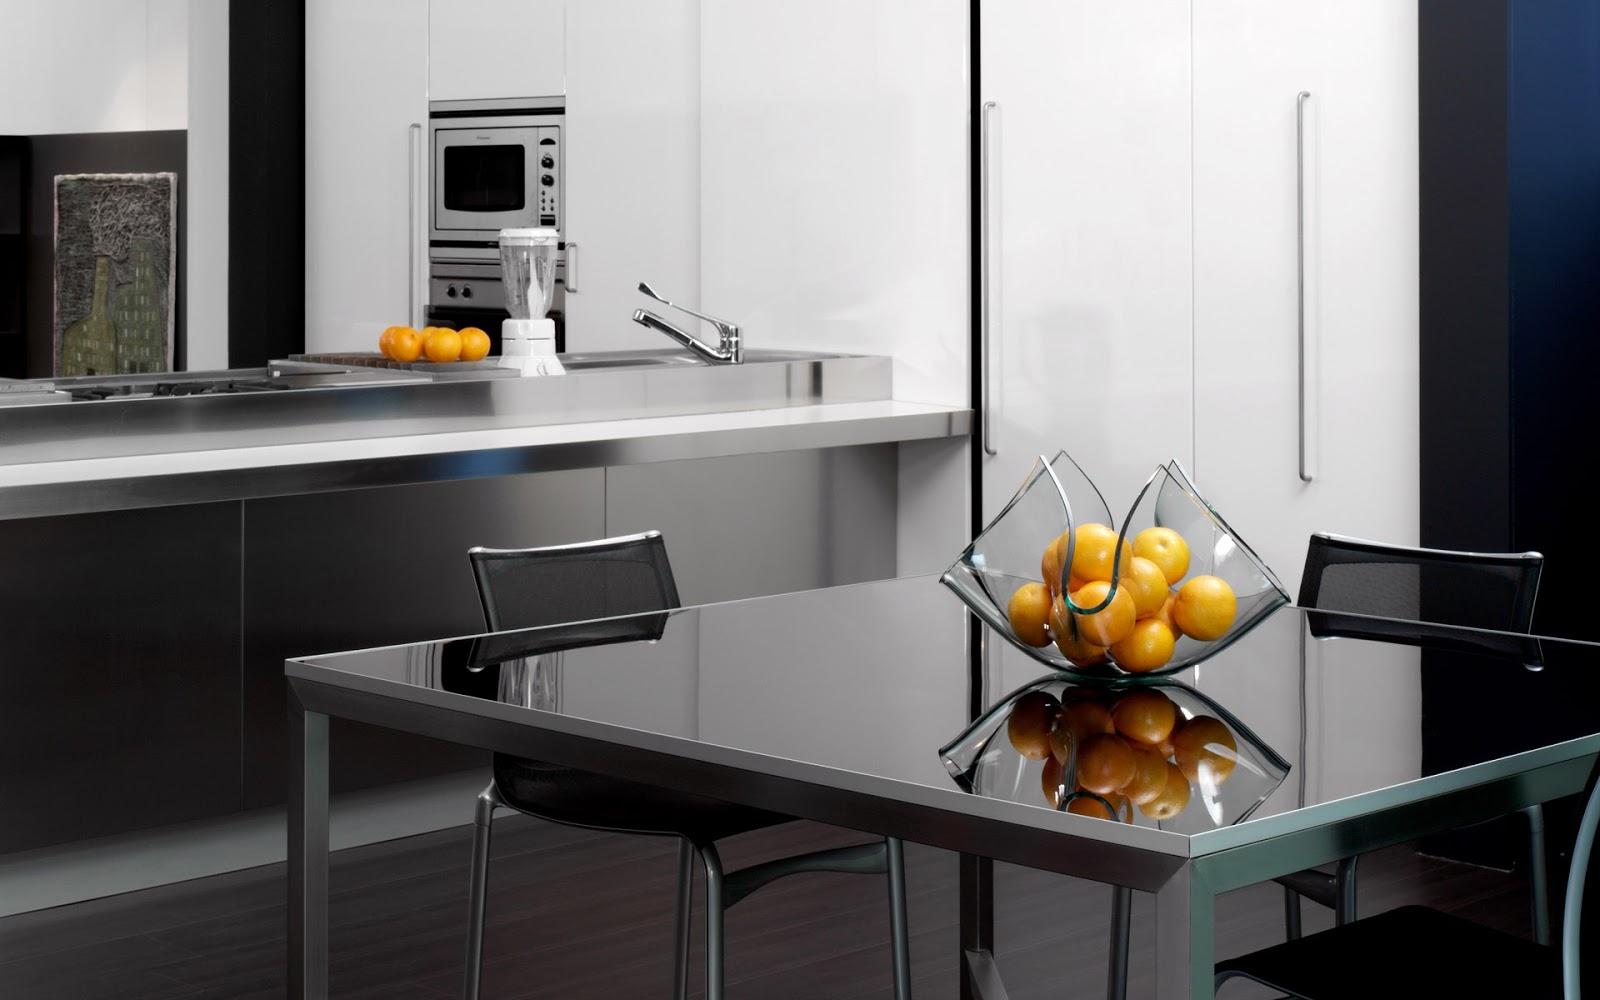 Kitchen Designs 2013 HD Wallpapers – wallpaper202